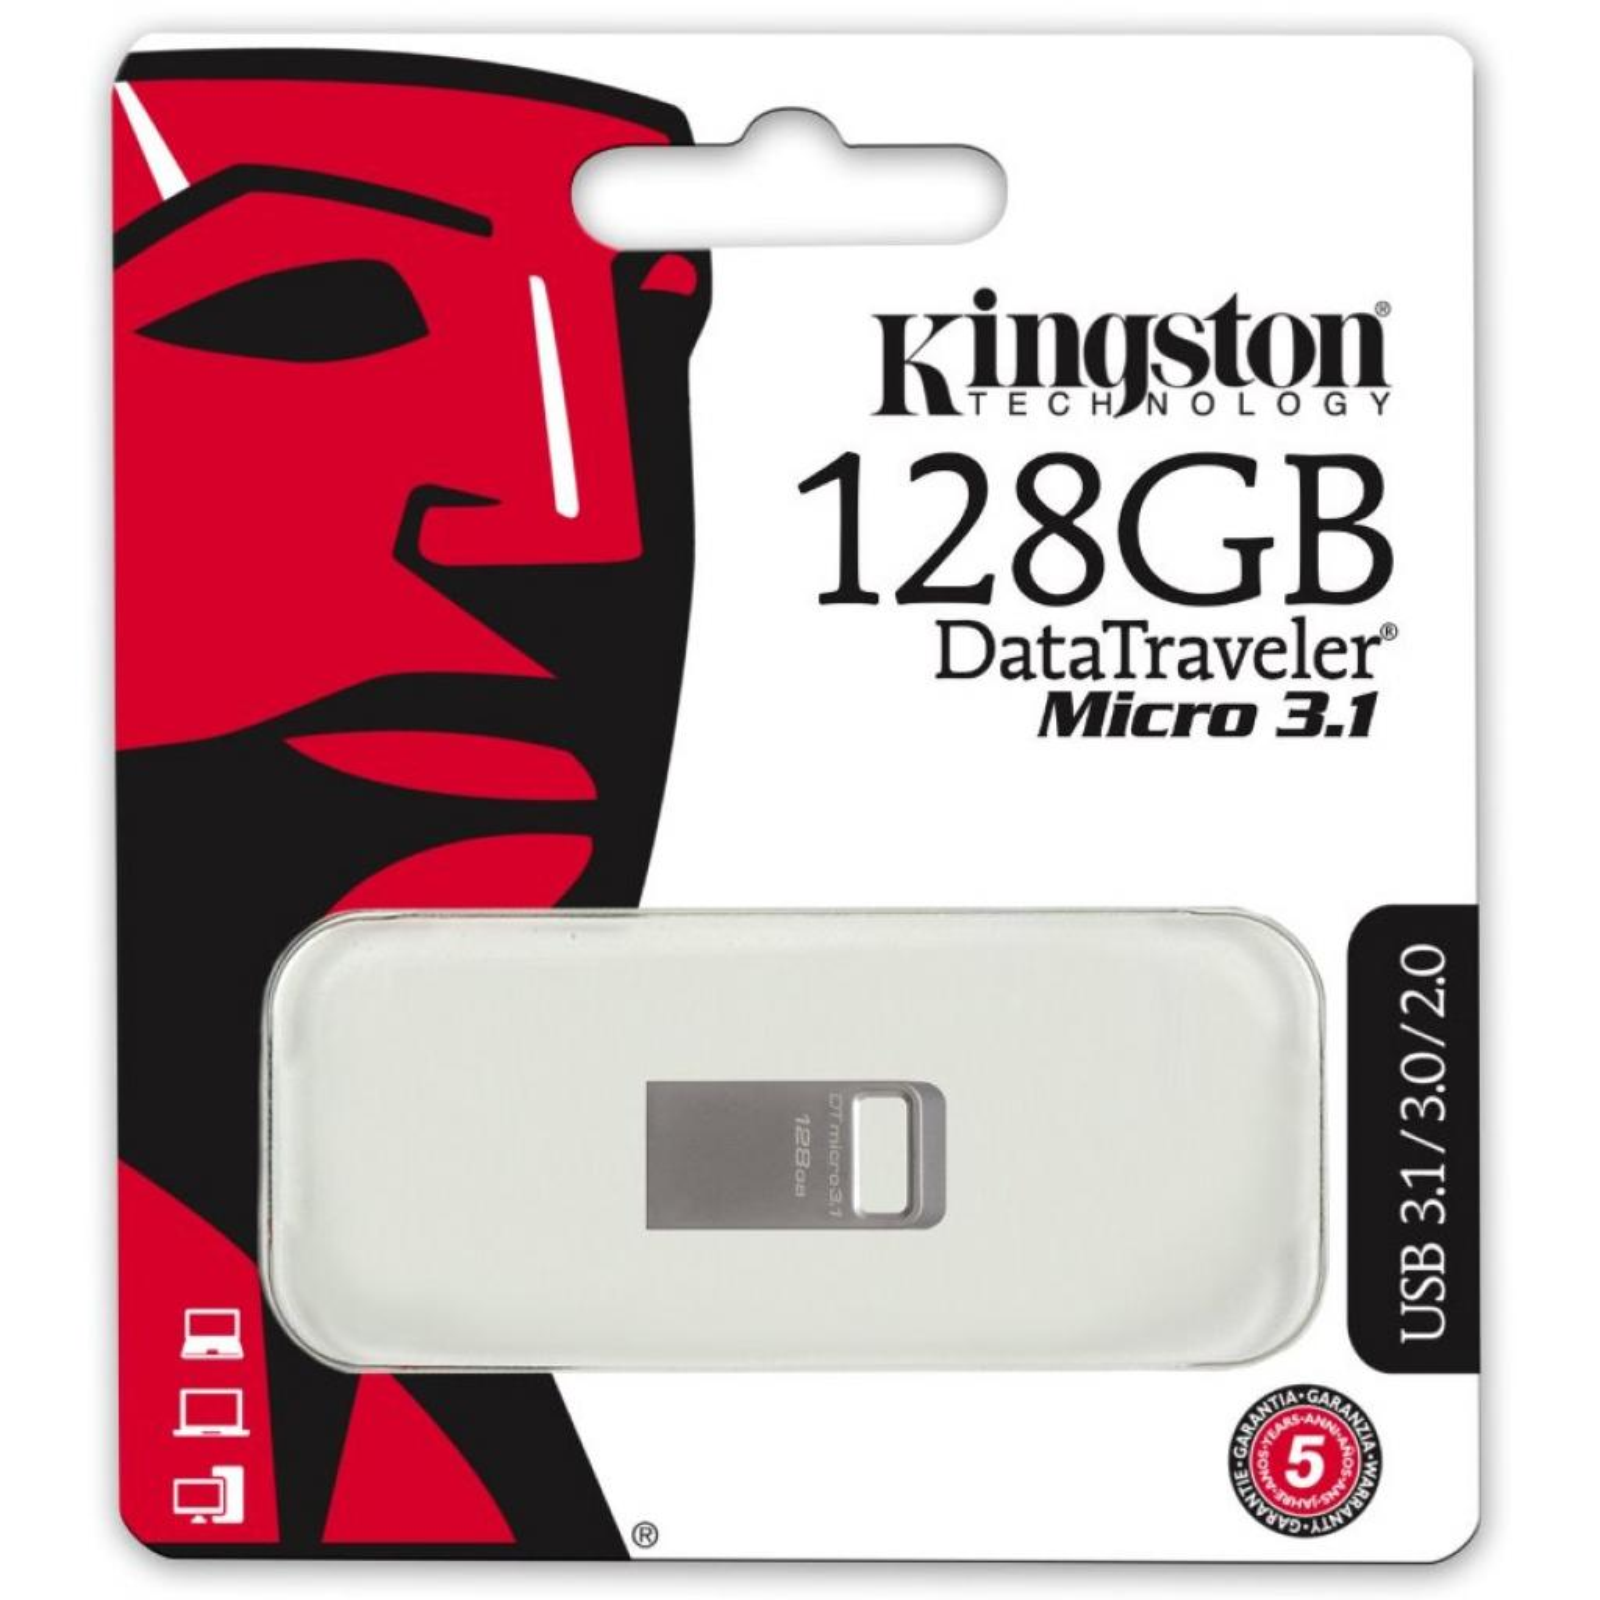 USB флеш накопитель Kingston 128GB DT Micro 3.1 USB 3.1 (DTMC3/128GB) изображение 4